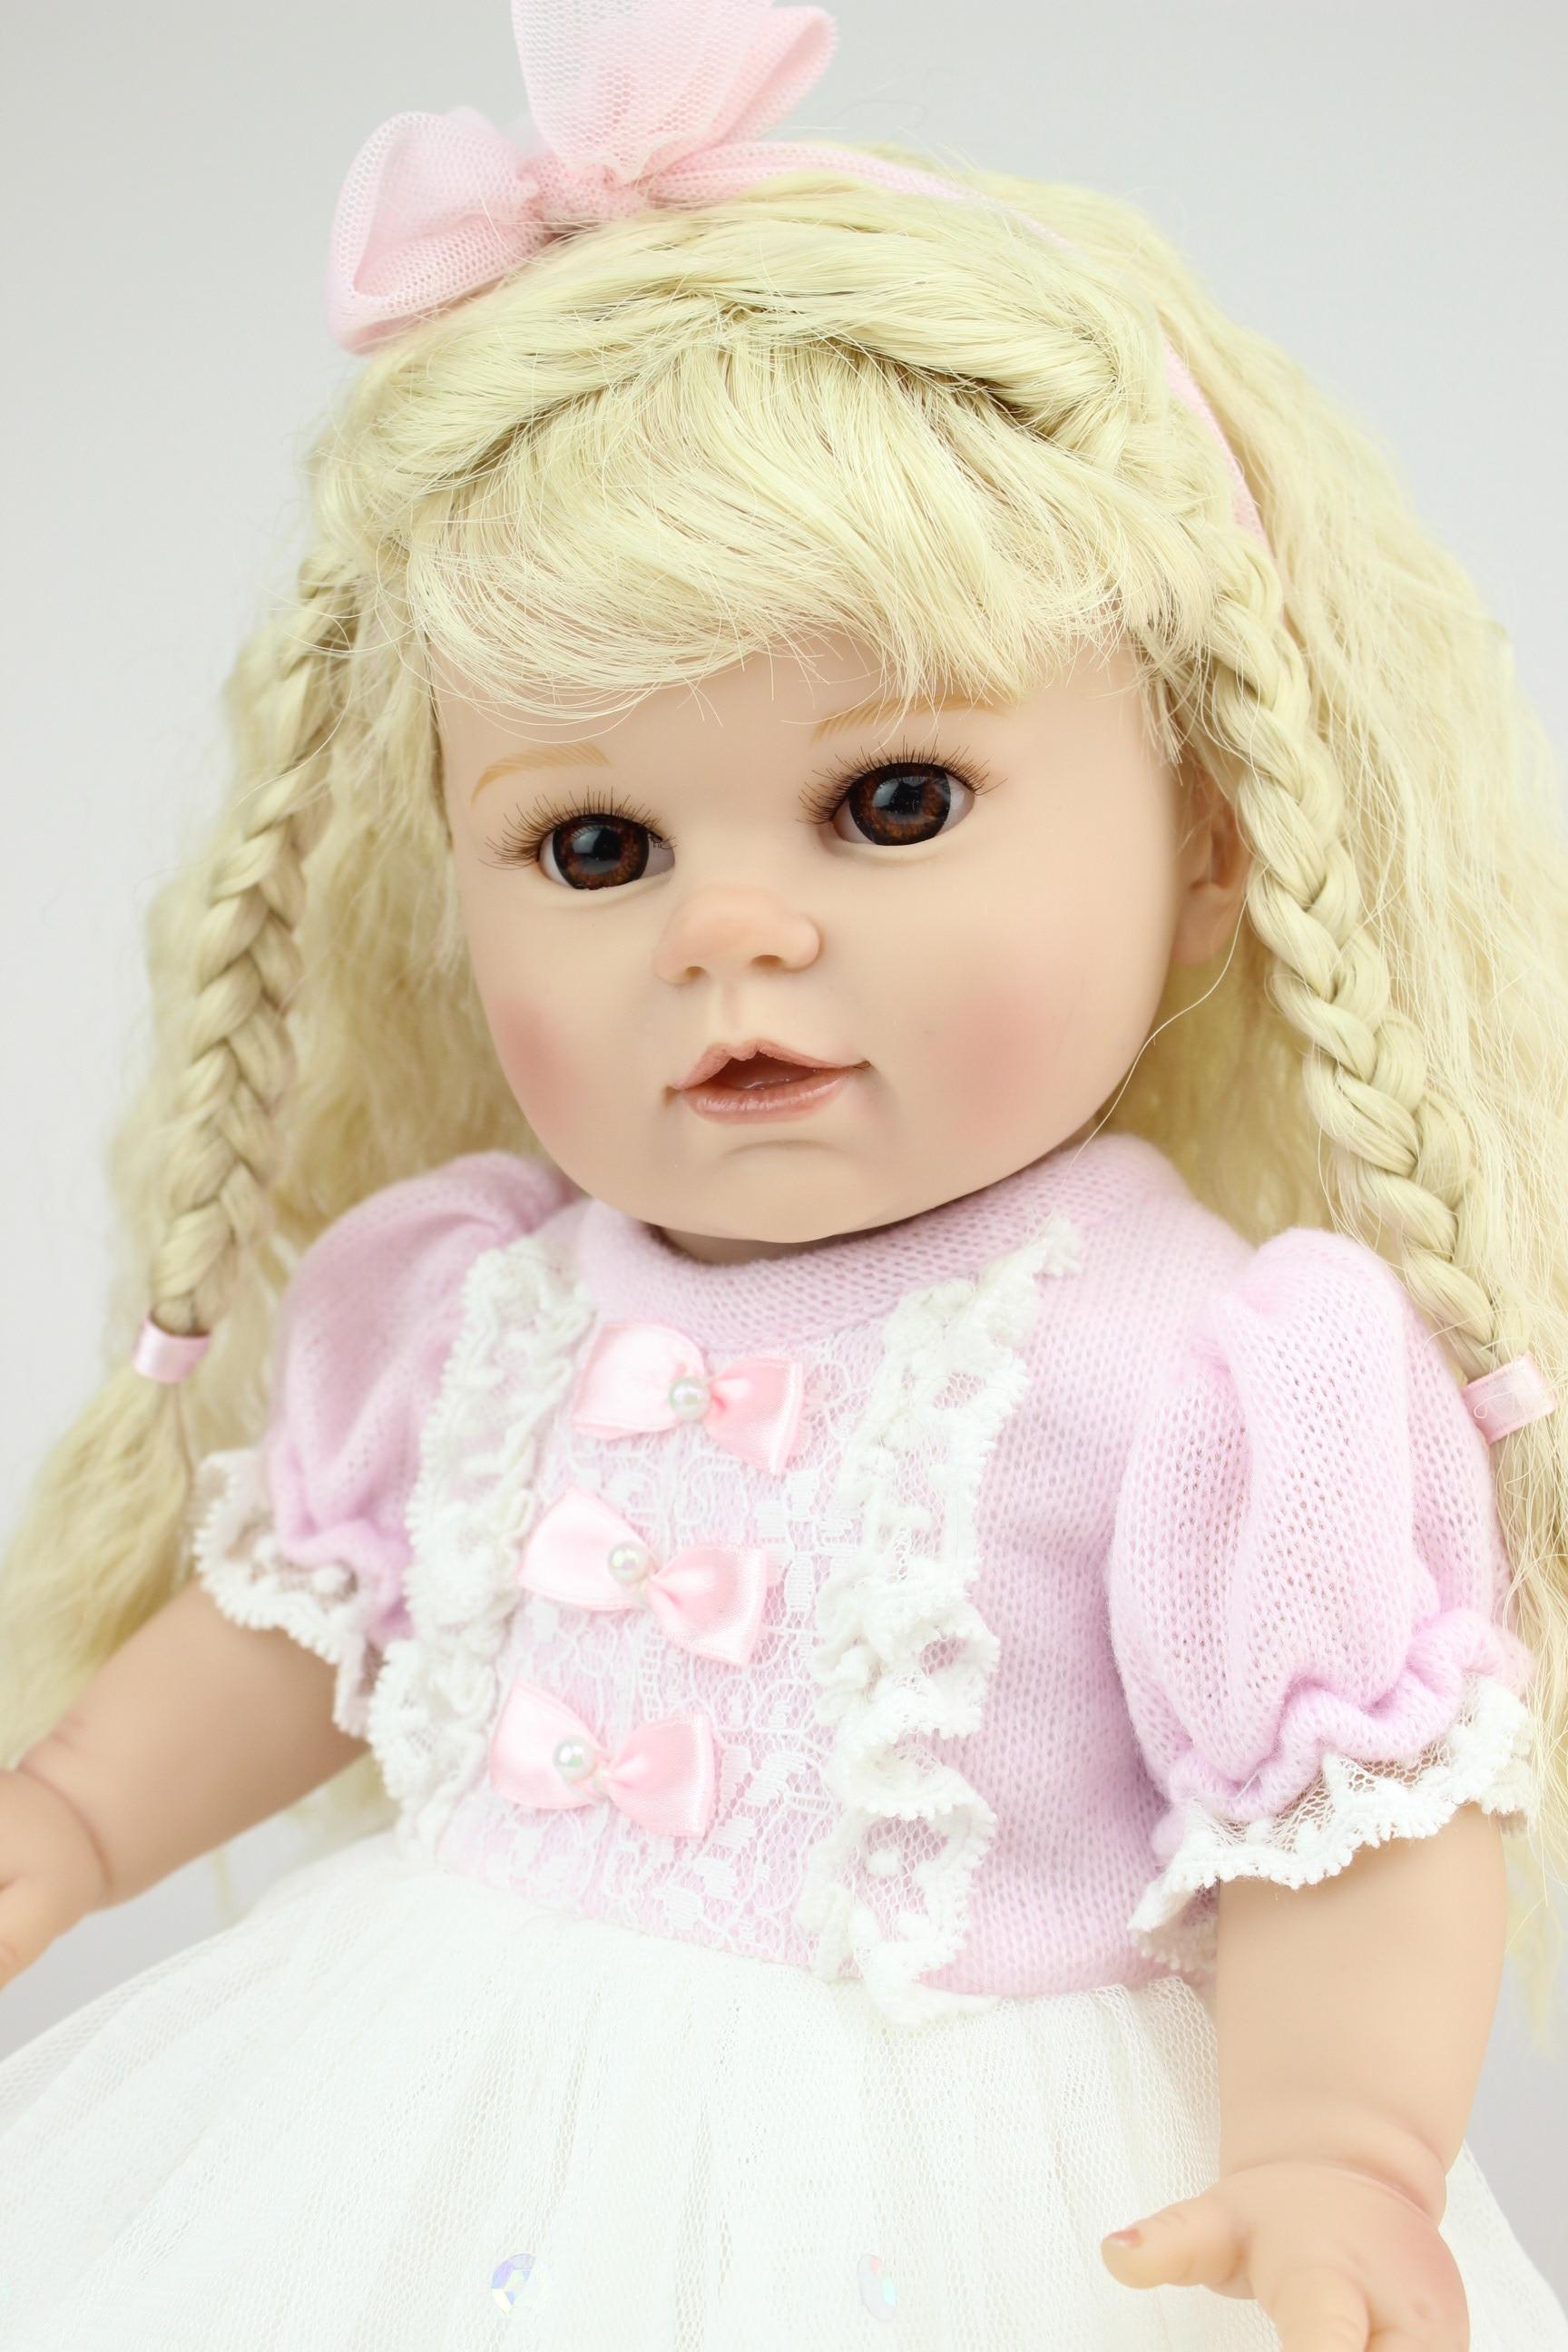 18 Inch Full Vinyl American Girl Doll Cute Lifelike Baby